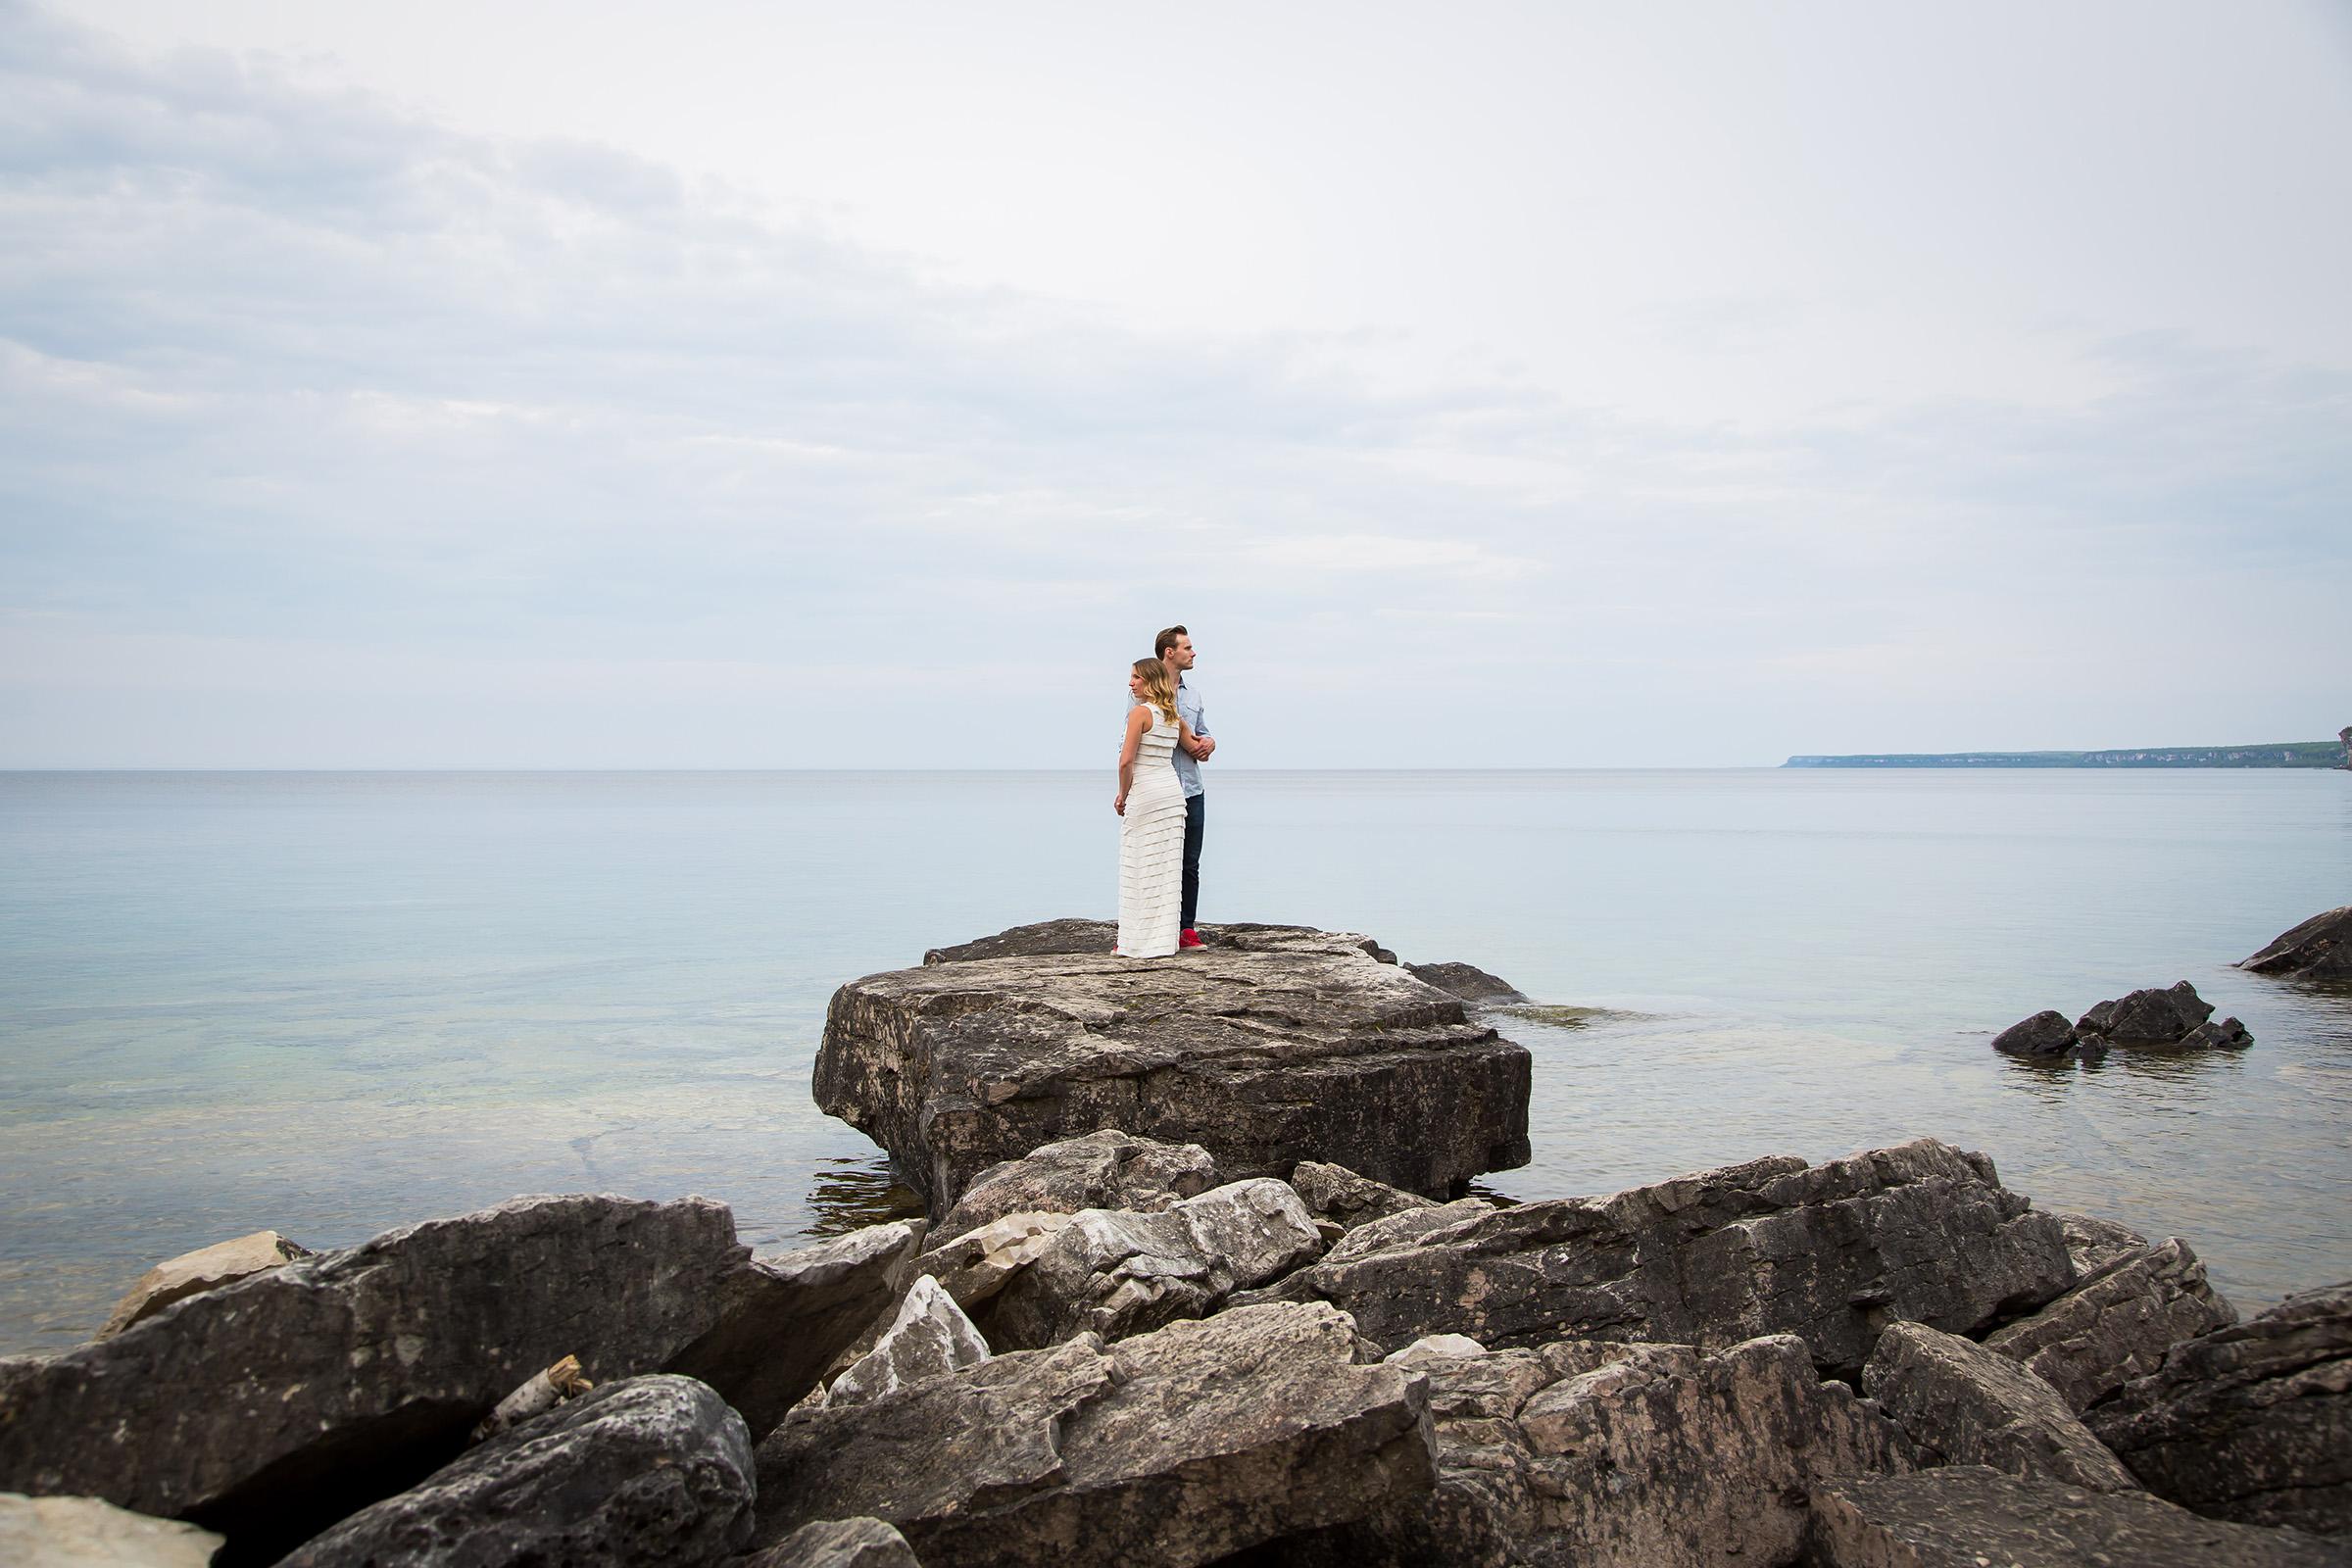 Moments-by-Lauren-Wedding-Photographer-Engagement-Tips-Photo-Image-02.jpg